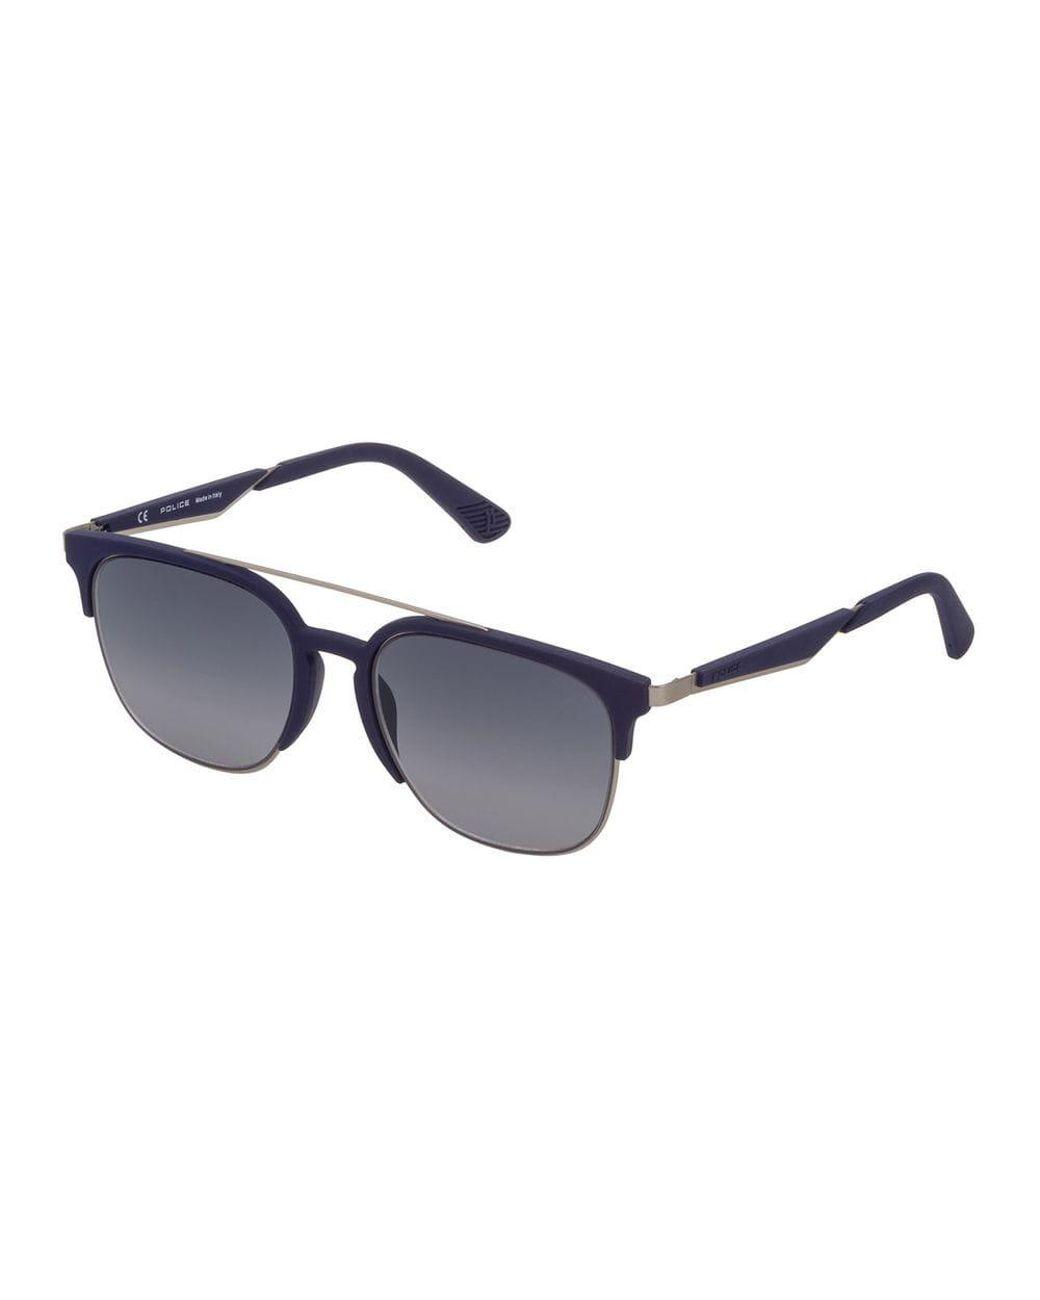 Sunglasses Police SPL 741 Green 0492